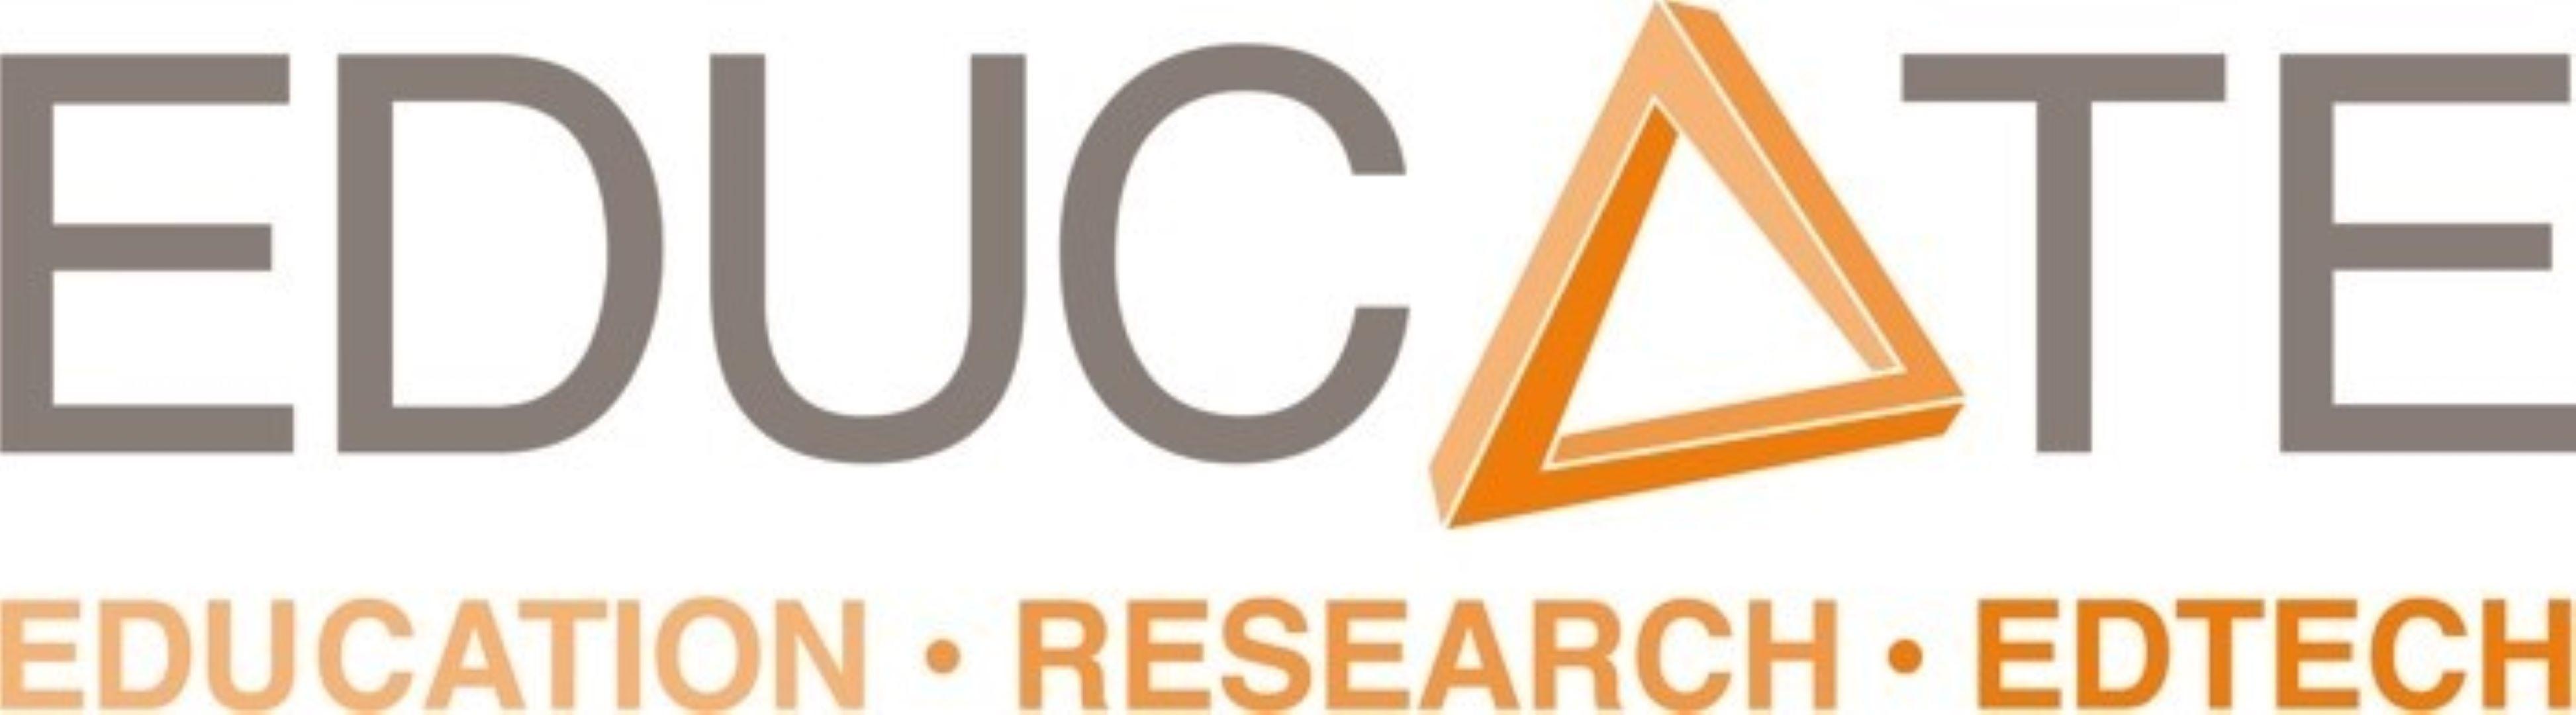 EDUCATE logo